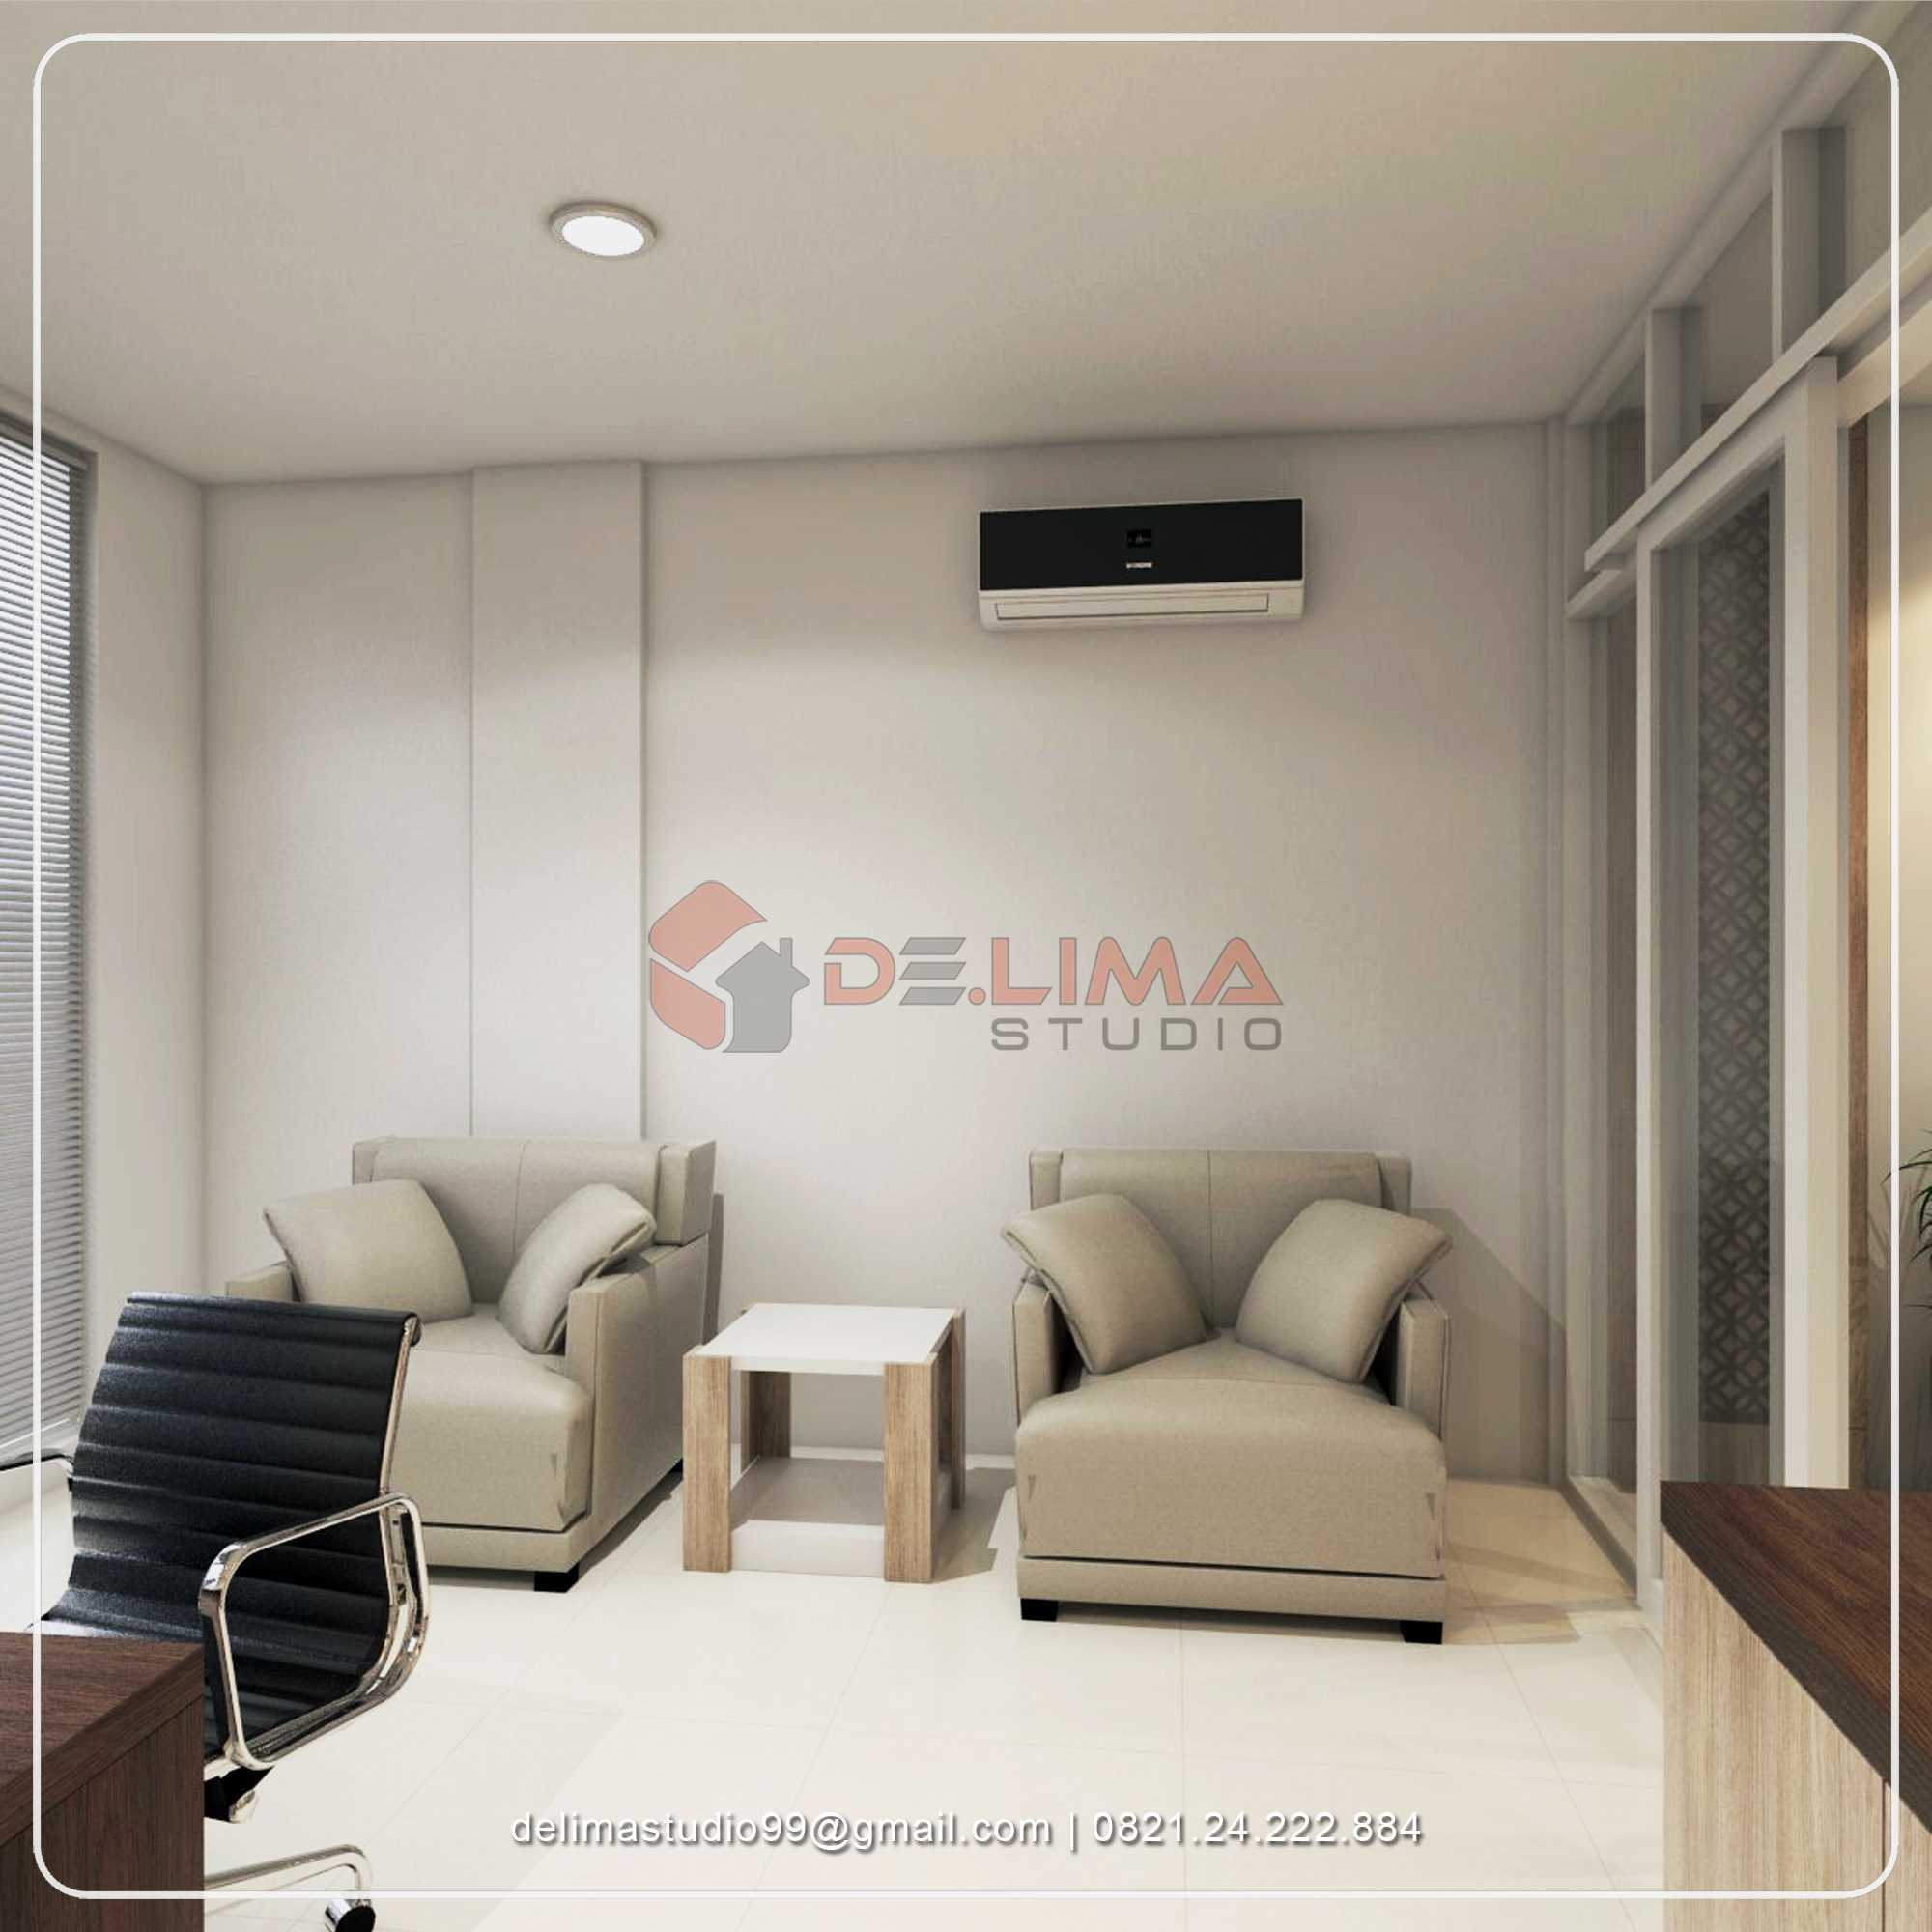 Delima Studio Office At Cikarang Sukamahi, Kec. Cikarang Pusat, Bekasi, Jawa Barat 17530, Indonesia Sukamahi, Kec. Cikarang Pusat, Bekasi, Jawa Barat 17530, Indonesia Delima-Studio-Office-At-Cikarang Modern 77712